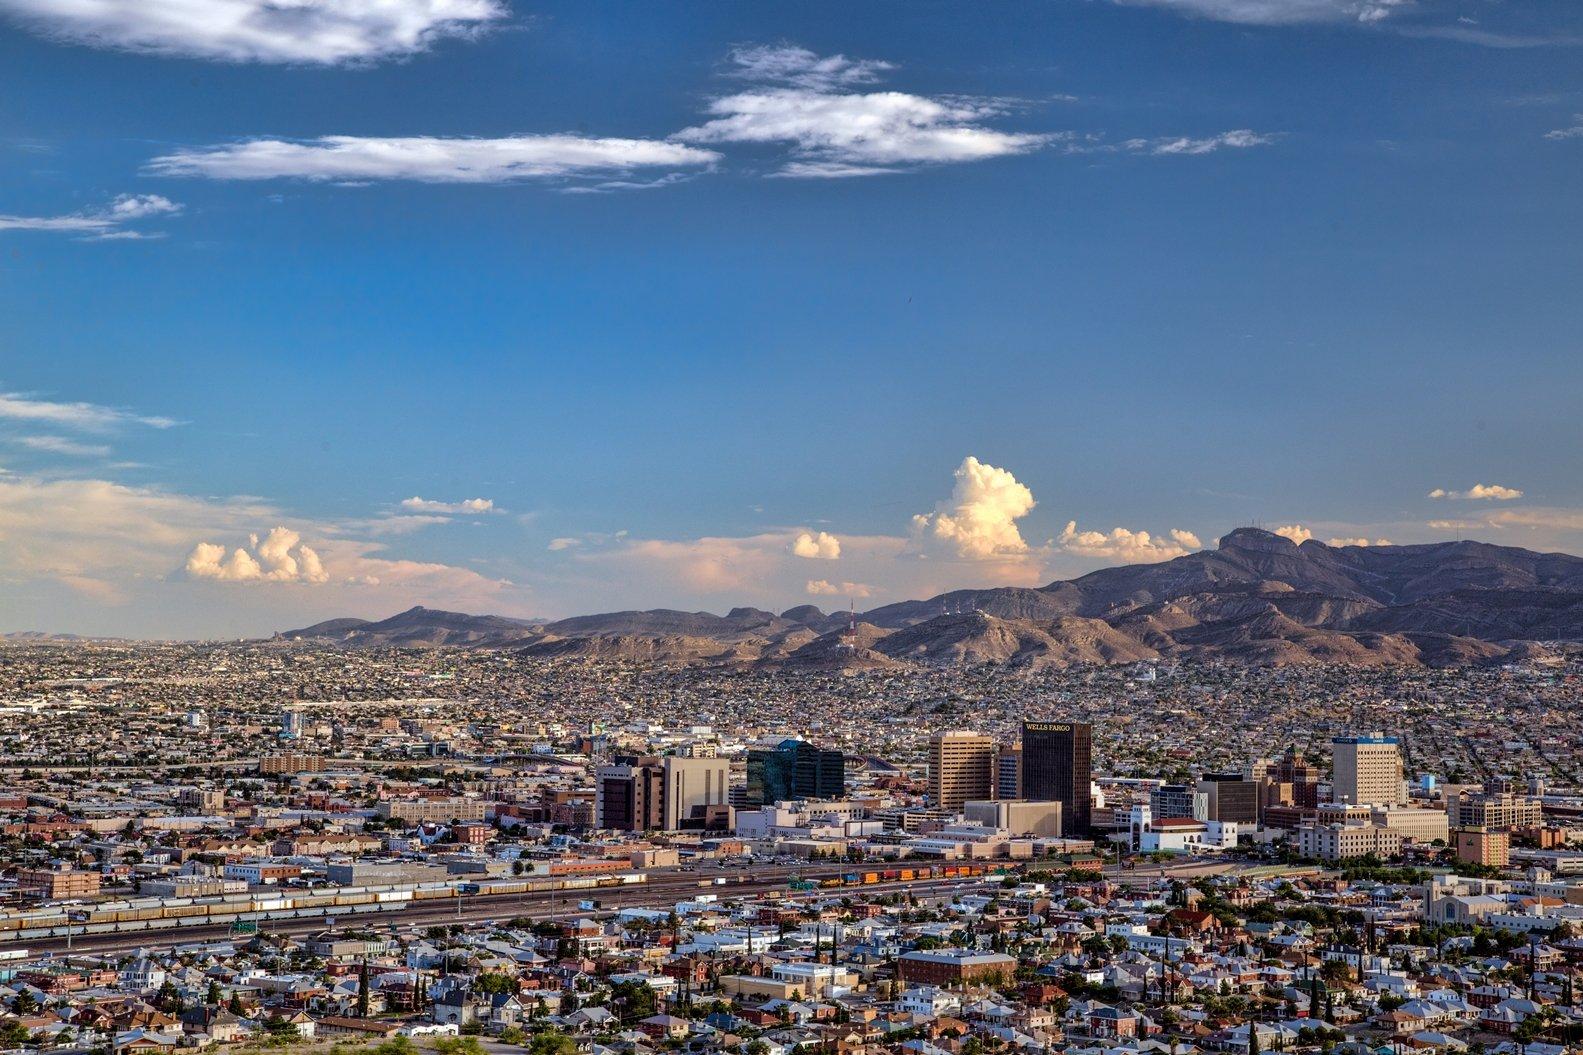 6 Best El Paso RV Parks For Snowbirds